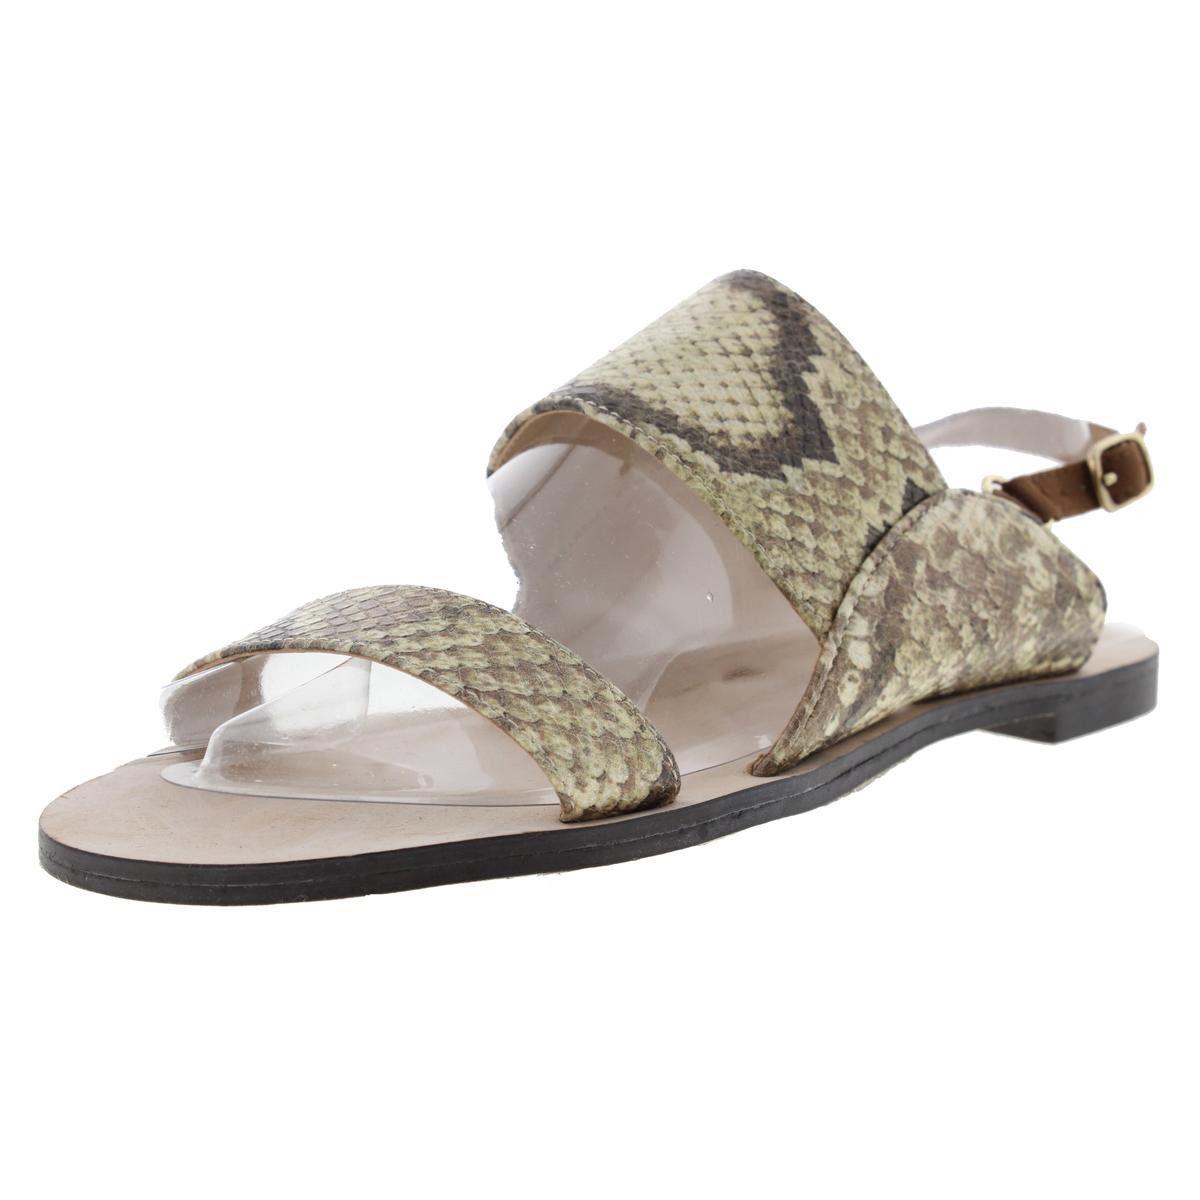 Zara Basic Womens Snake Print Flats Slingback Sandals